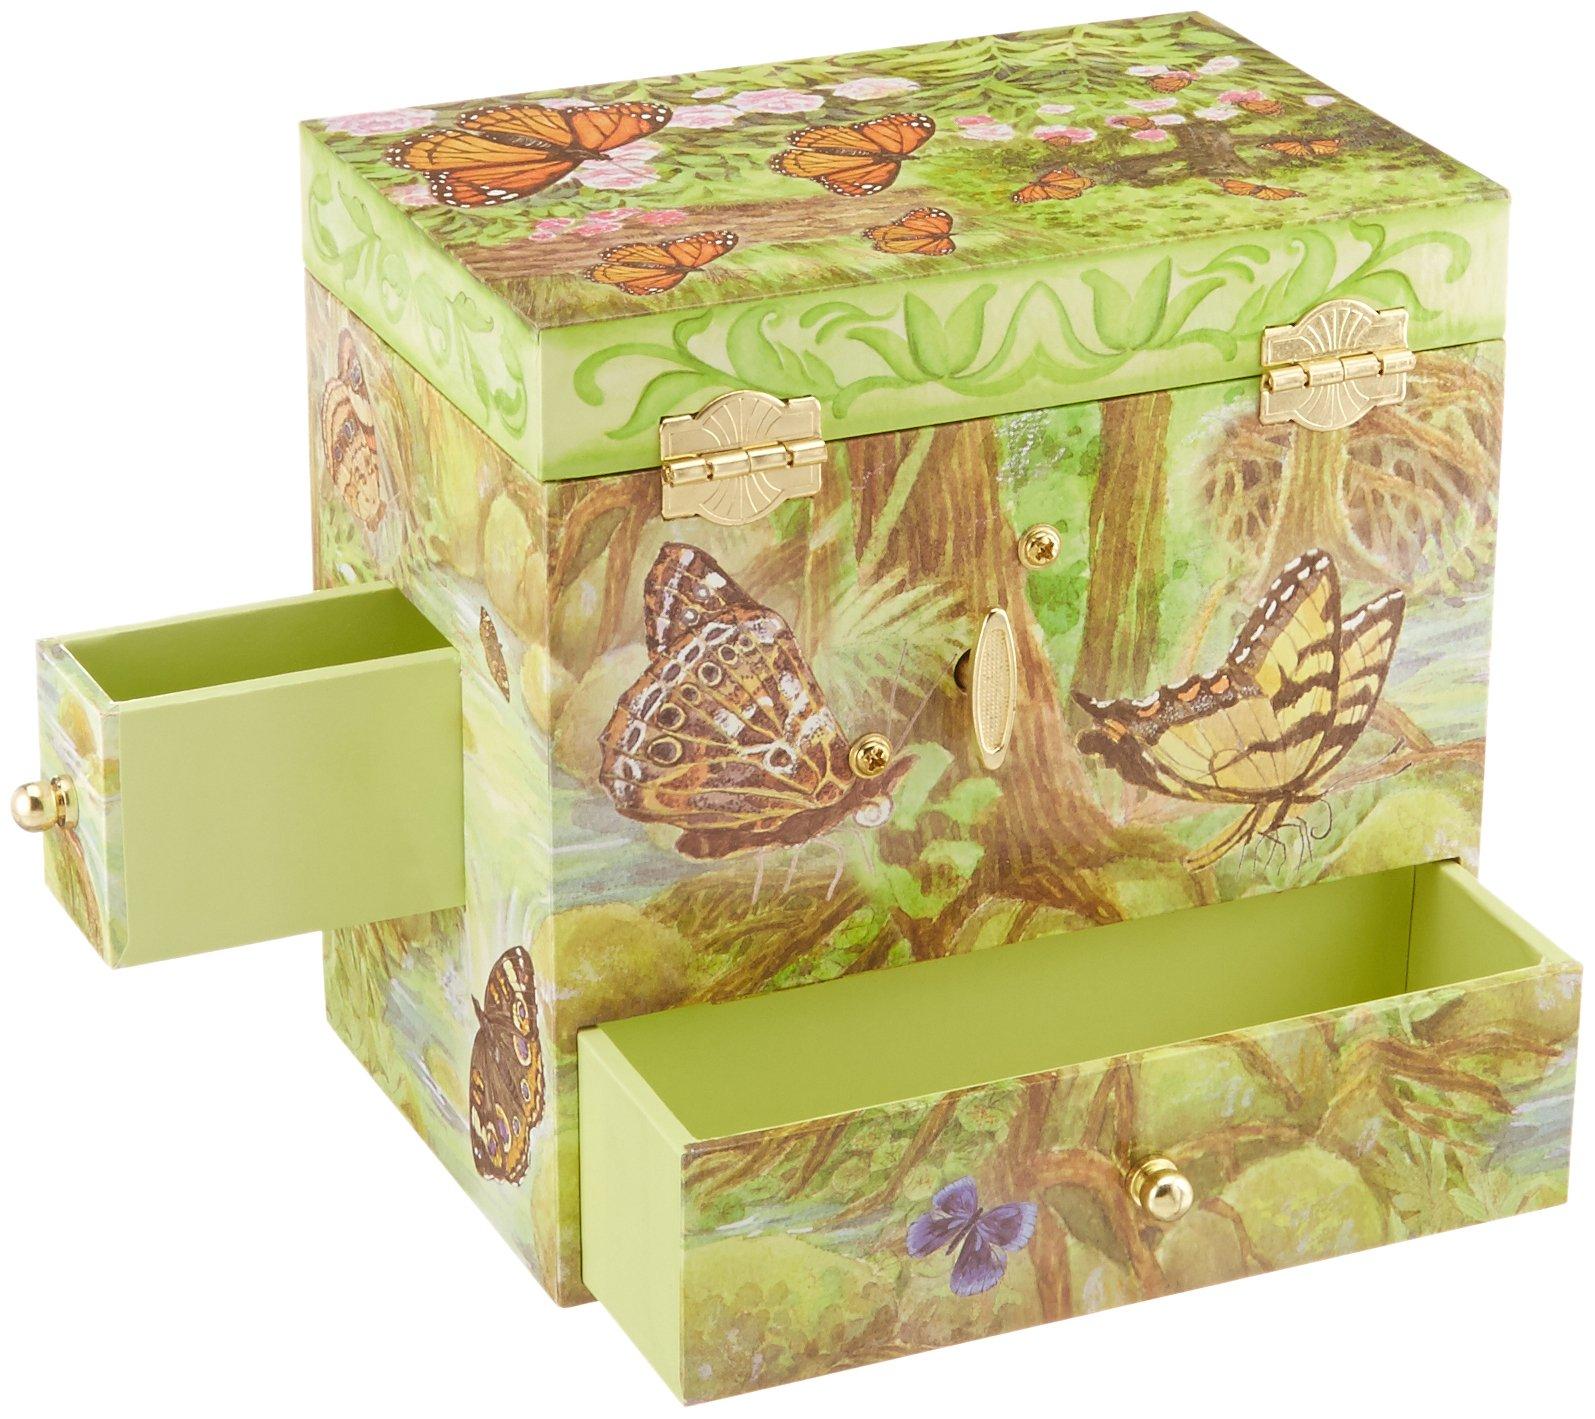 Enchantmints Monarchs Butterfly Music Jewelry Box by Enchantmints (Image #4)